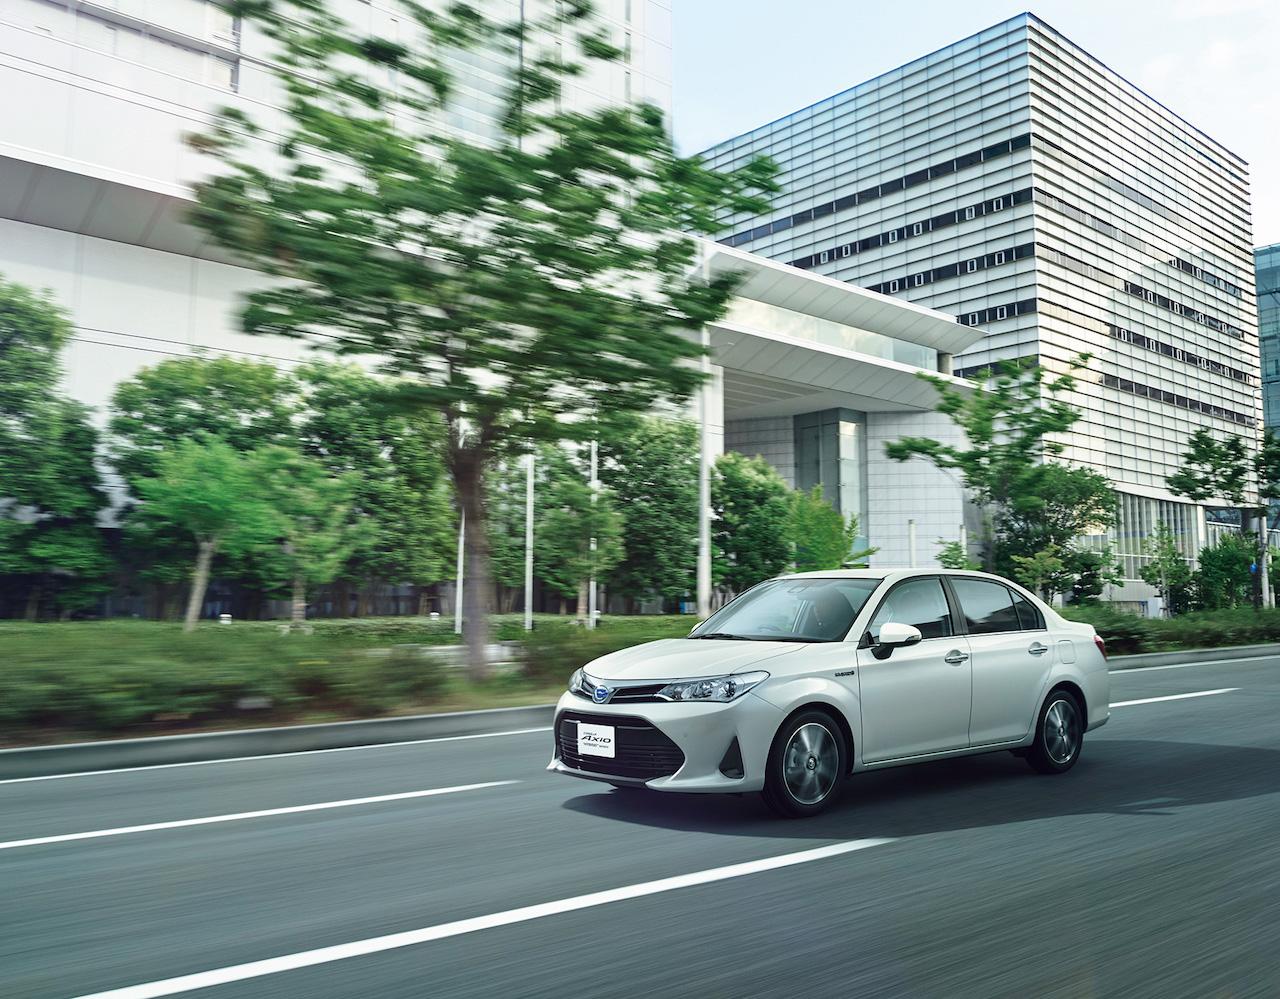 2018-Toyota-Corolla-Axio-front-three-quarters.jpg